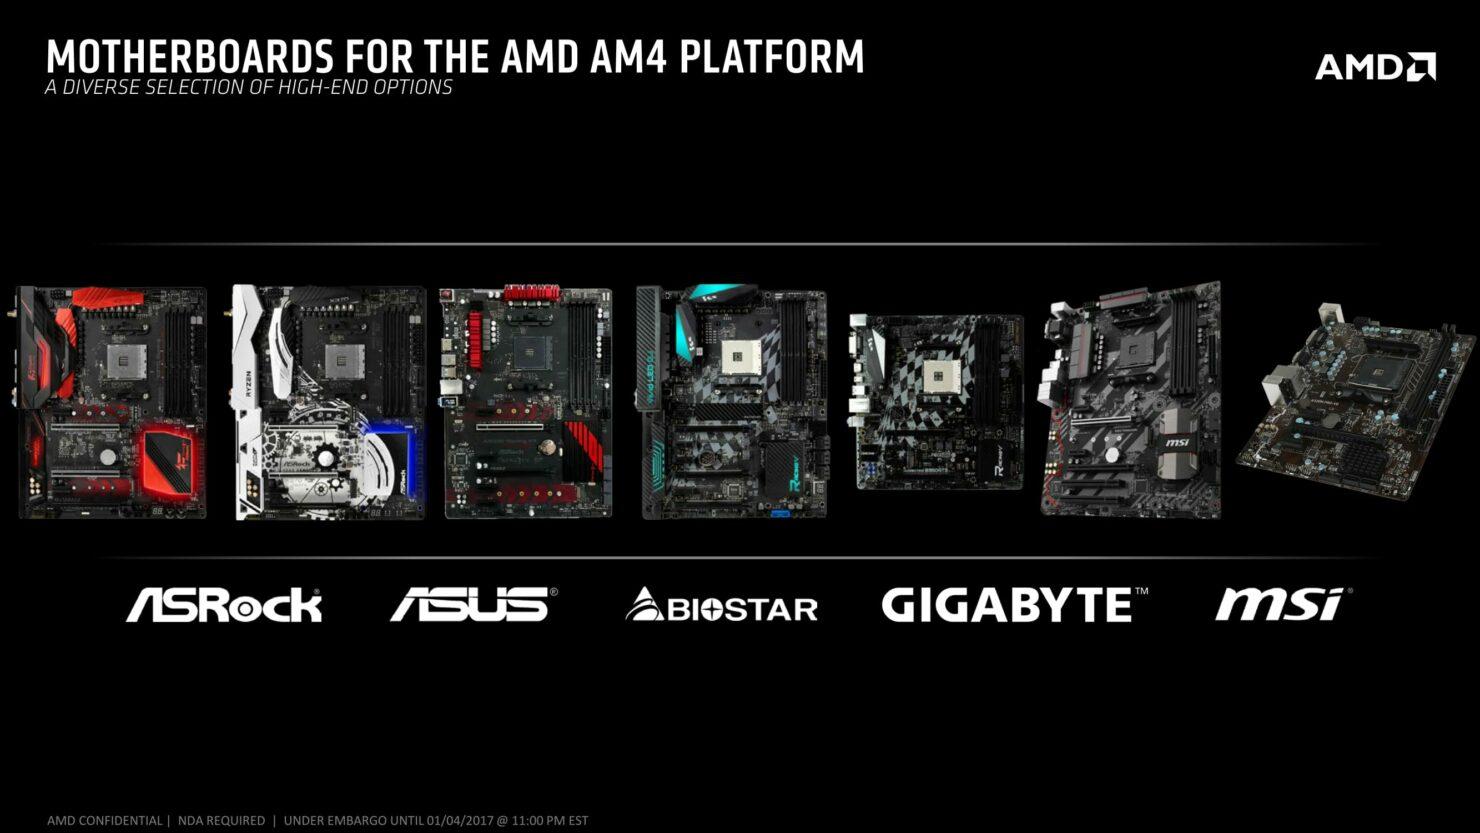 AMD Warns Motherboard Makers From Offering Ryzen 5000 Desktop CPU BIOS Support on AM4 X370 Boards